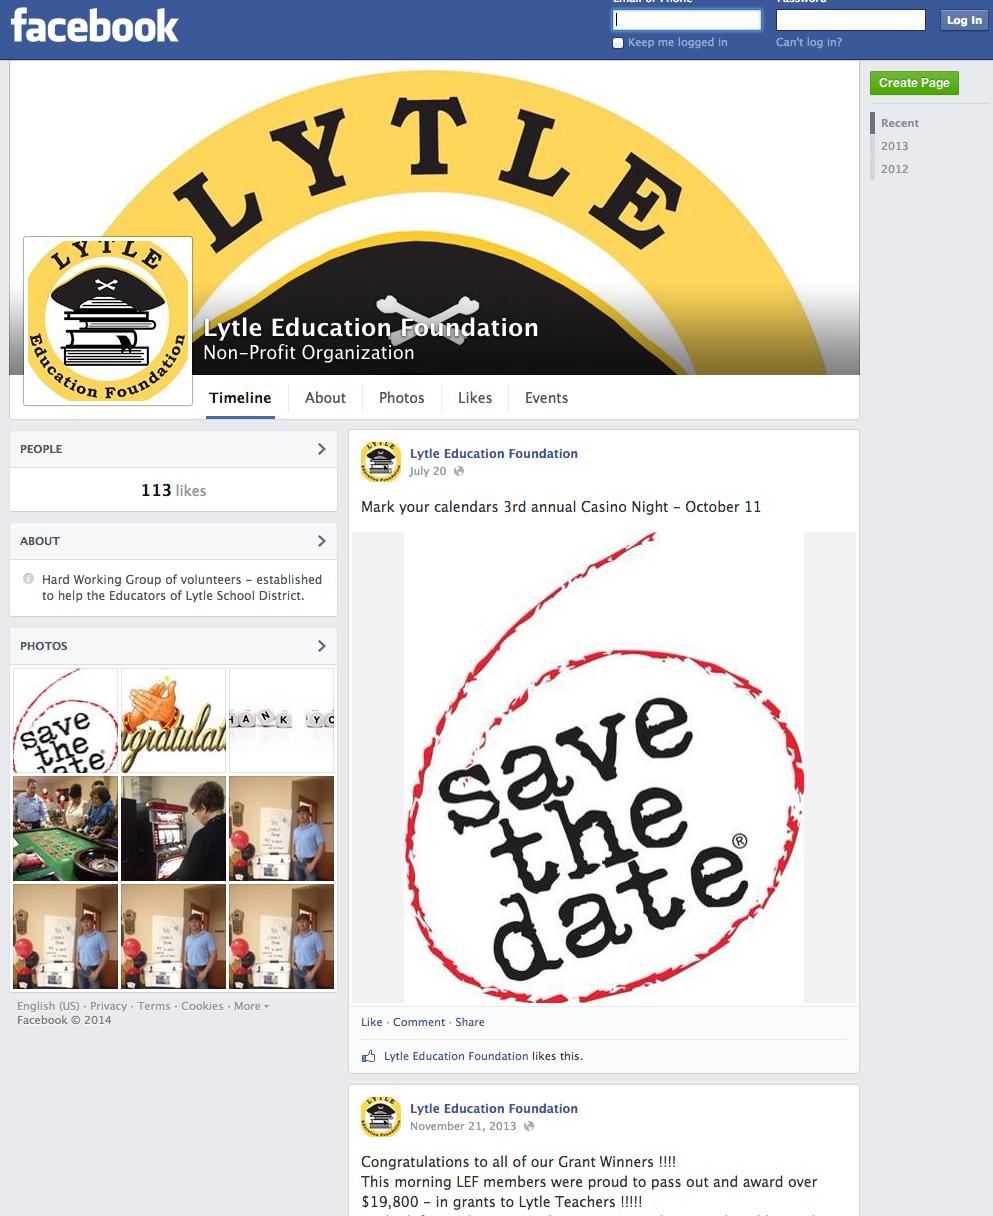 lytleeducationfoundationfacebook